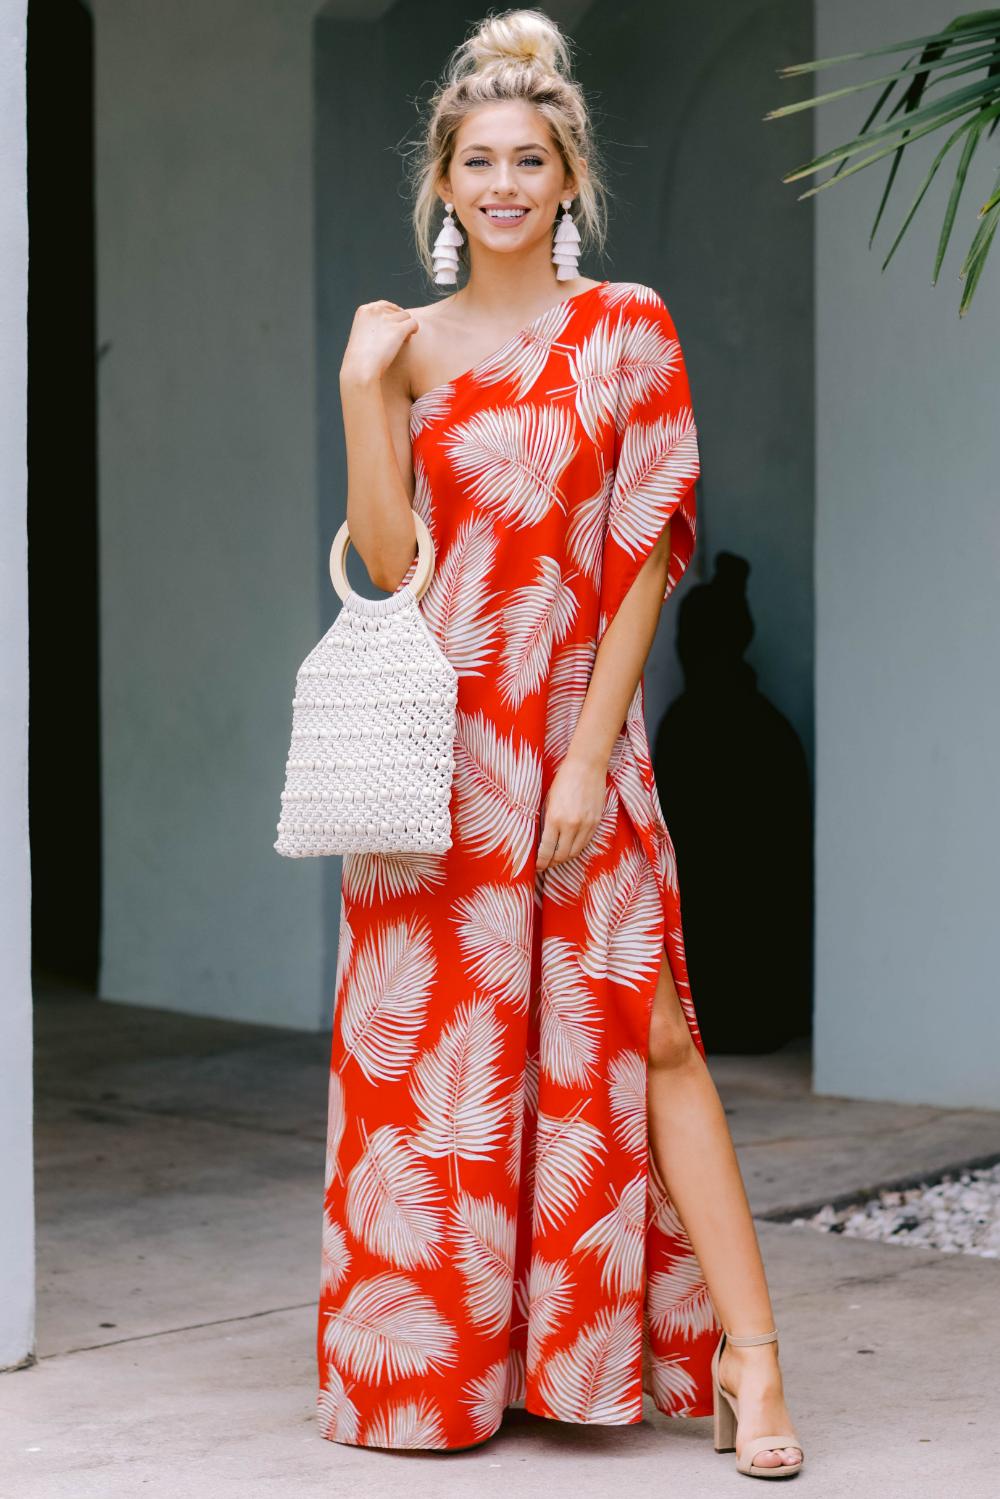 Stunning Flame Red Dress Maxi Dress One Shoulder Dress